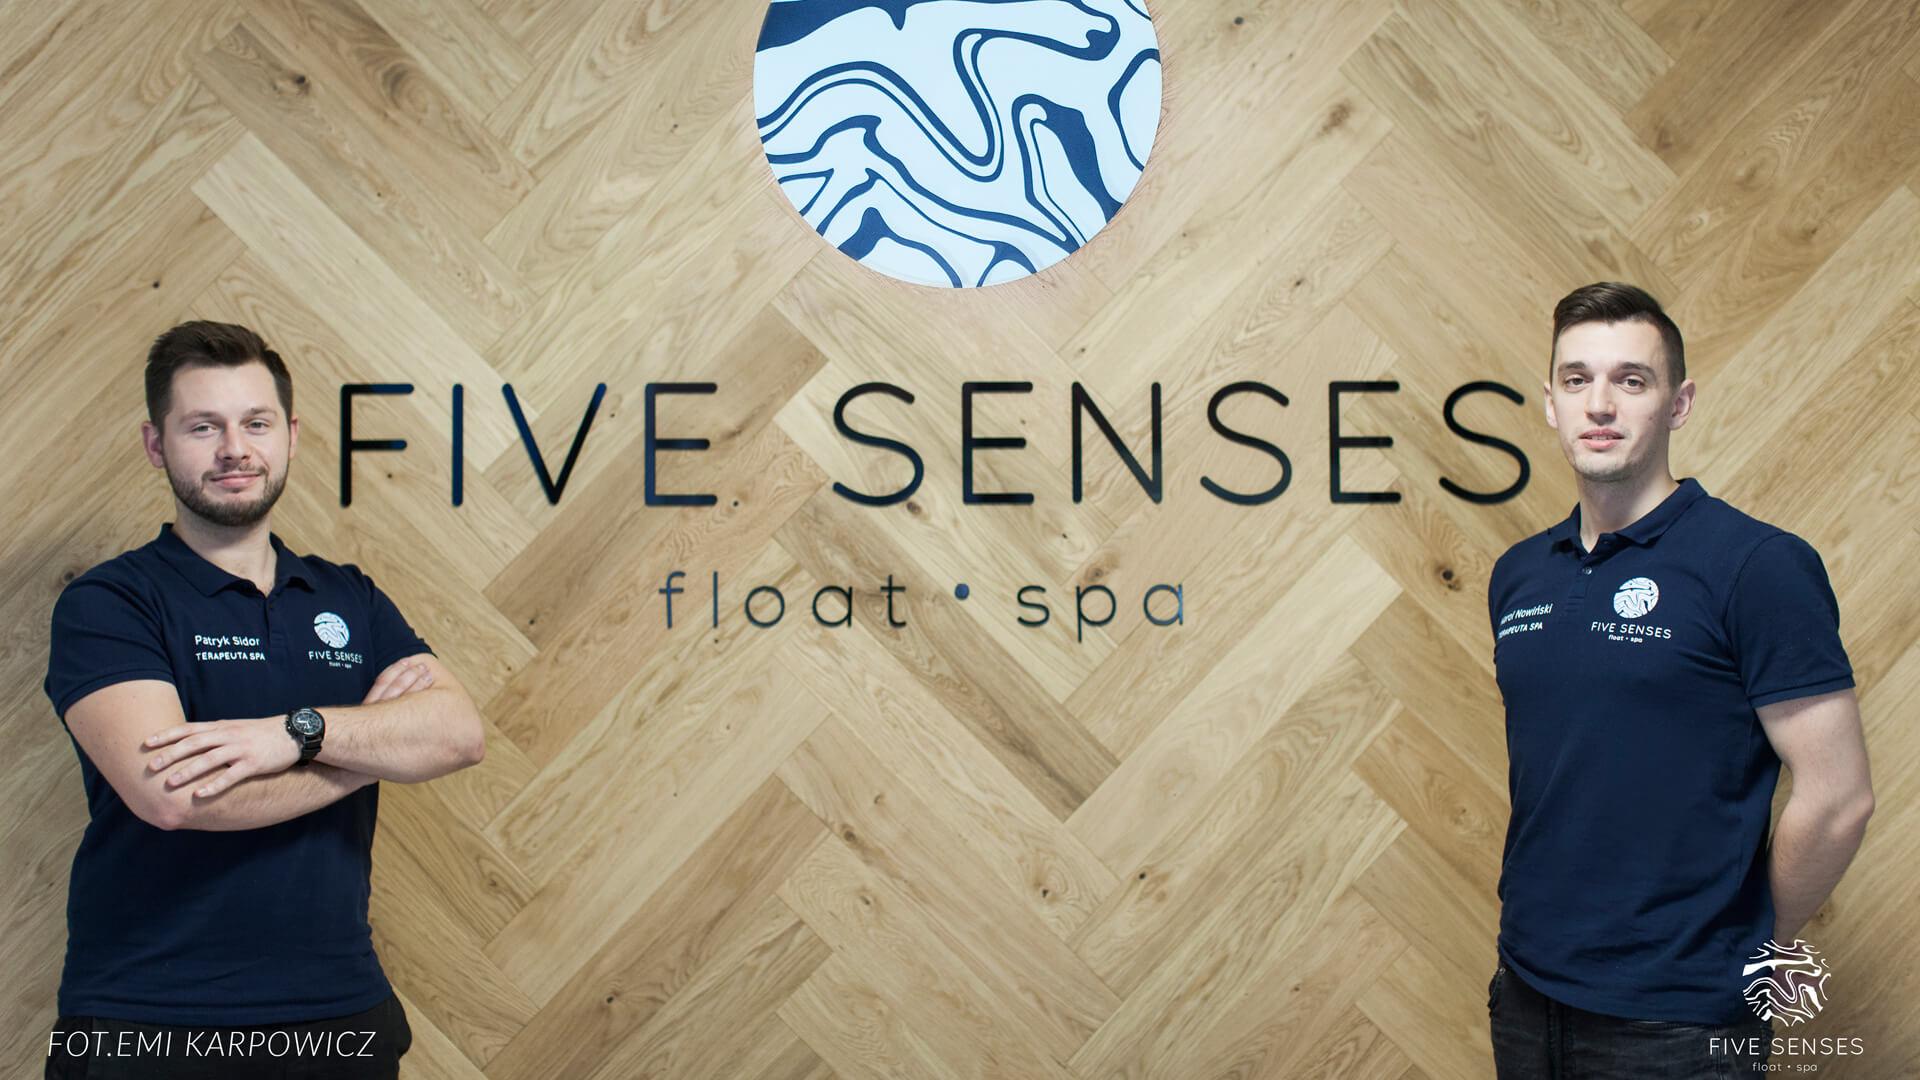 Five Senses Floating